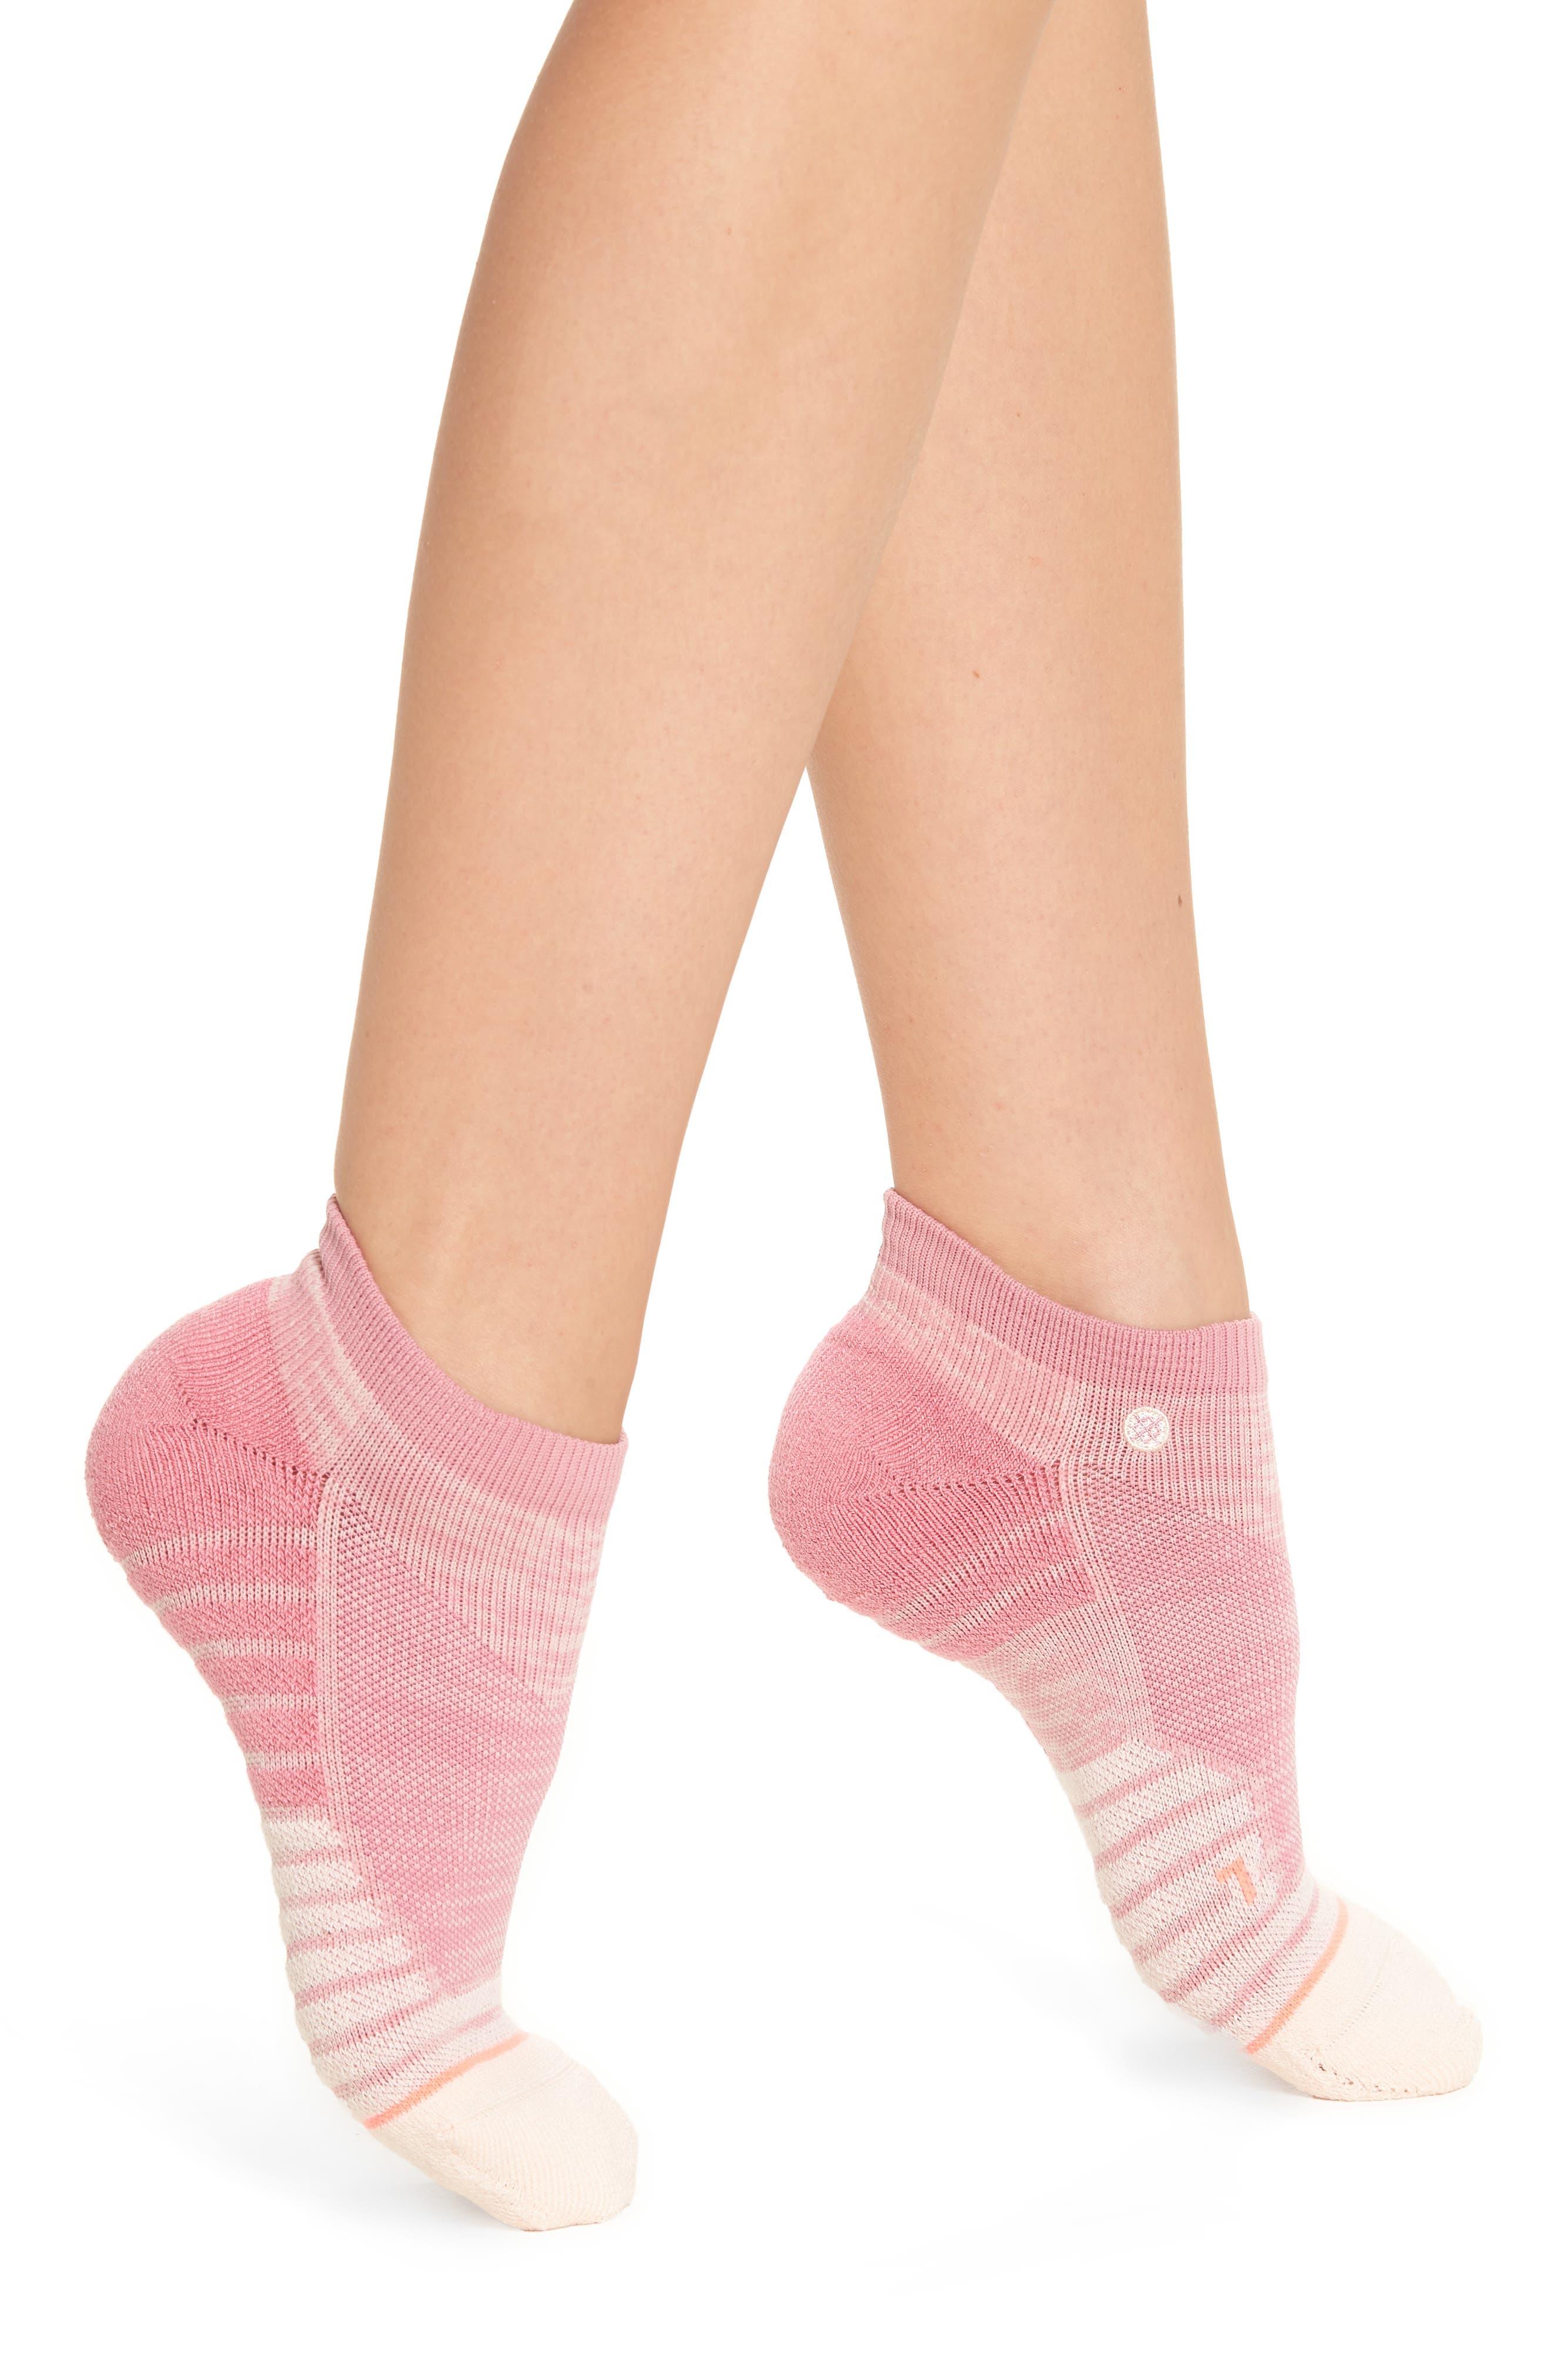 Circuit Athletic Low Cut Socks,                             Main thumbnail 1, color,                             Pink